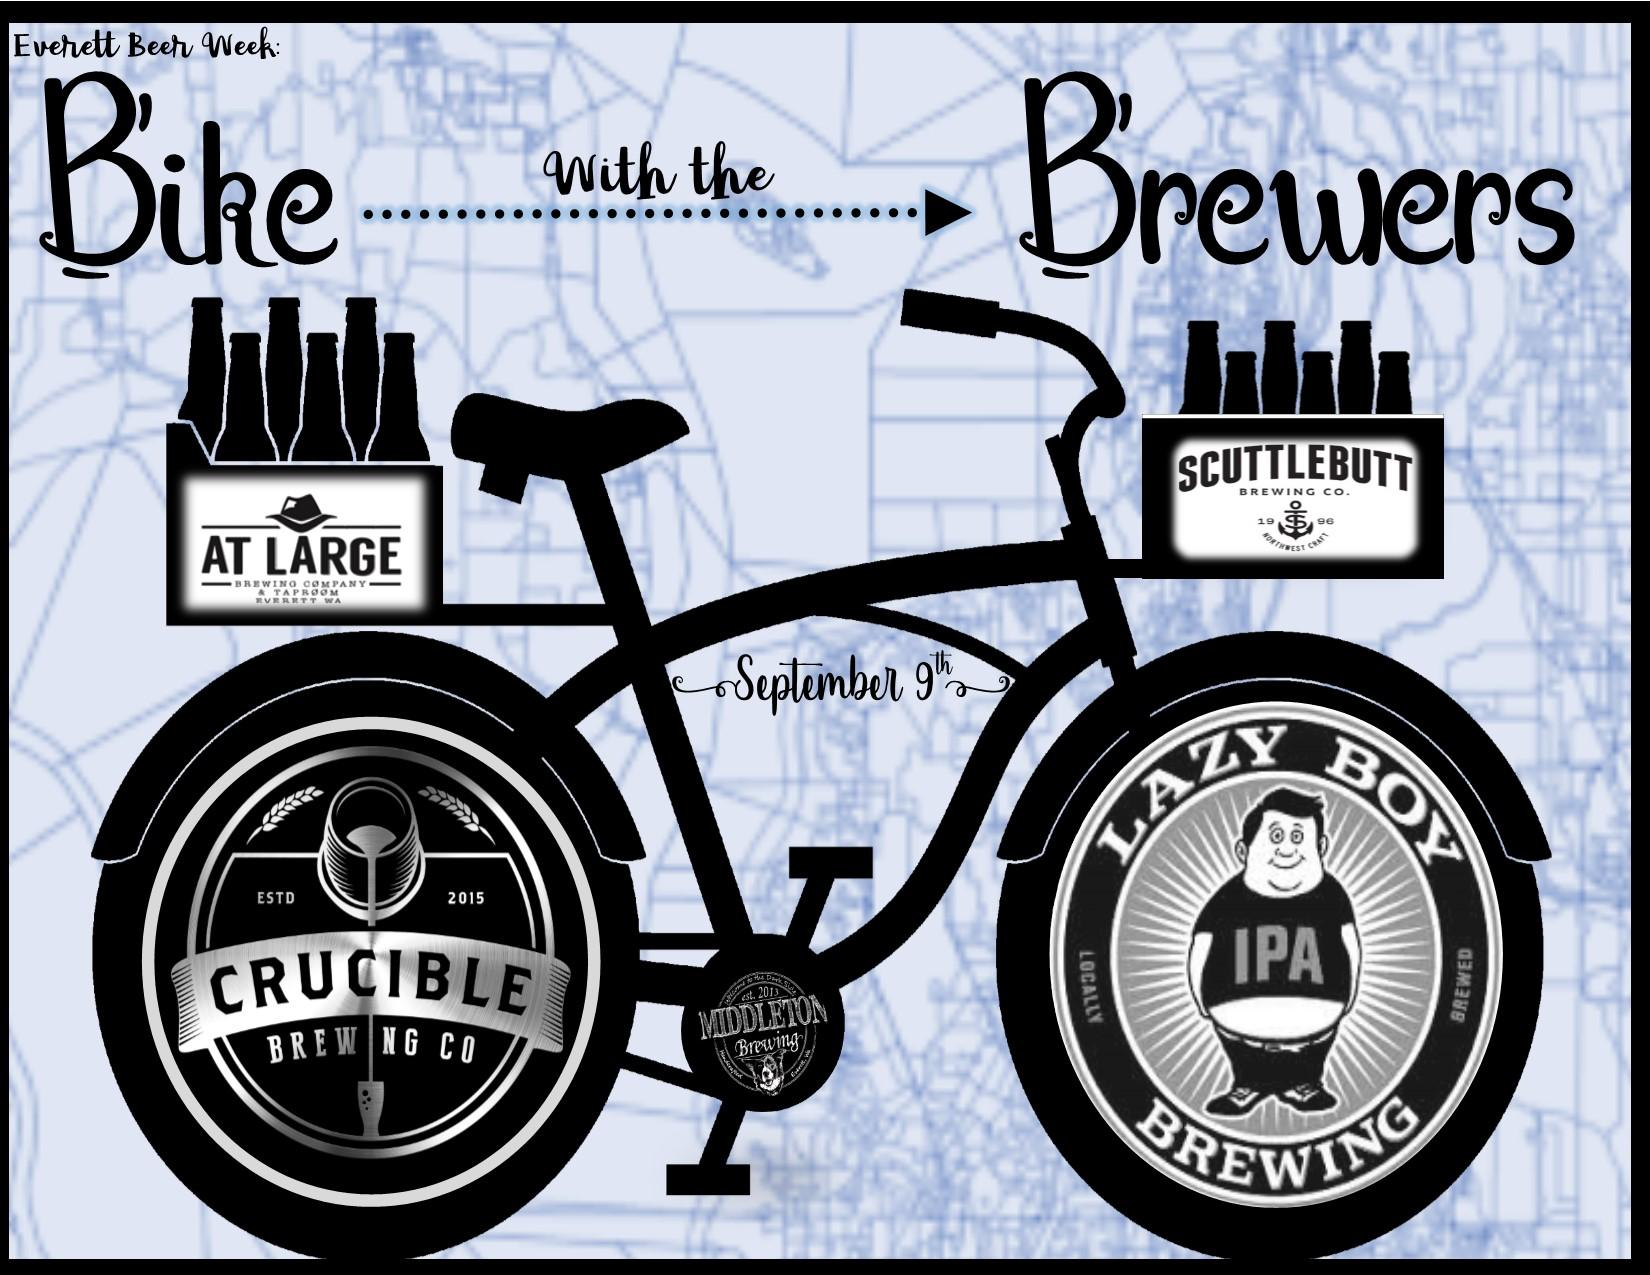 Bike wt Brewers.jpg